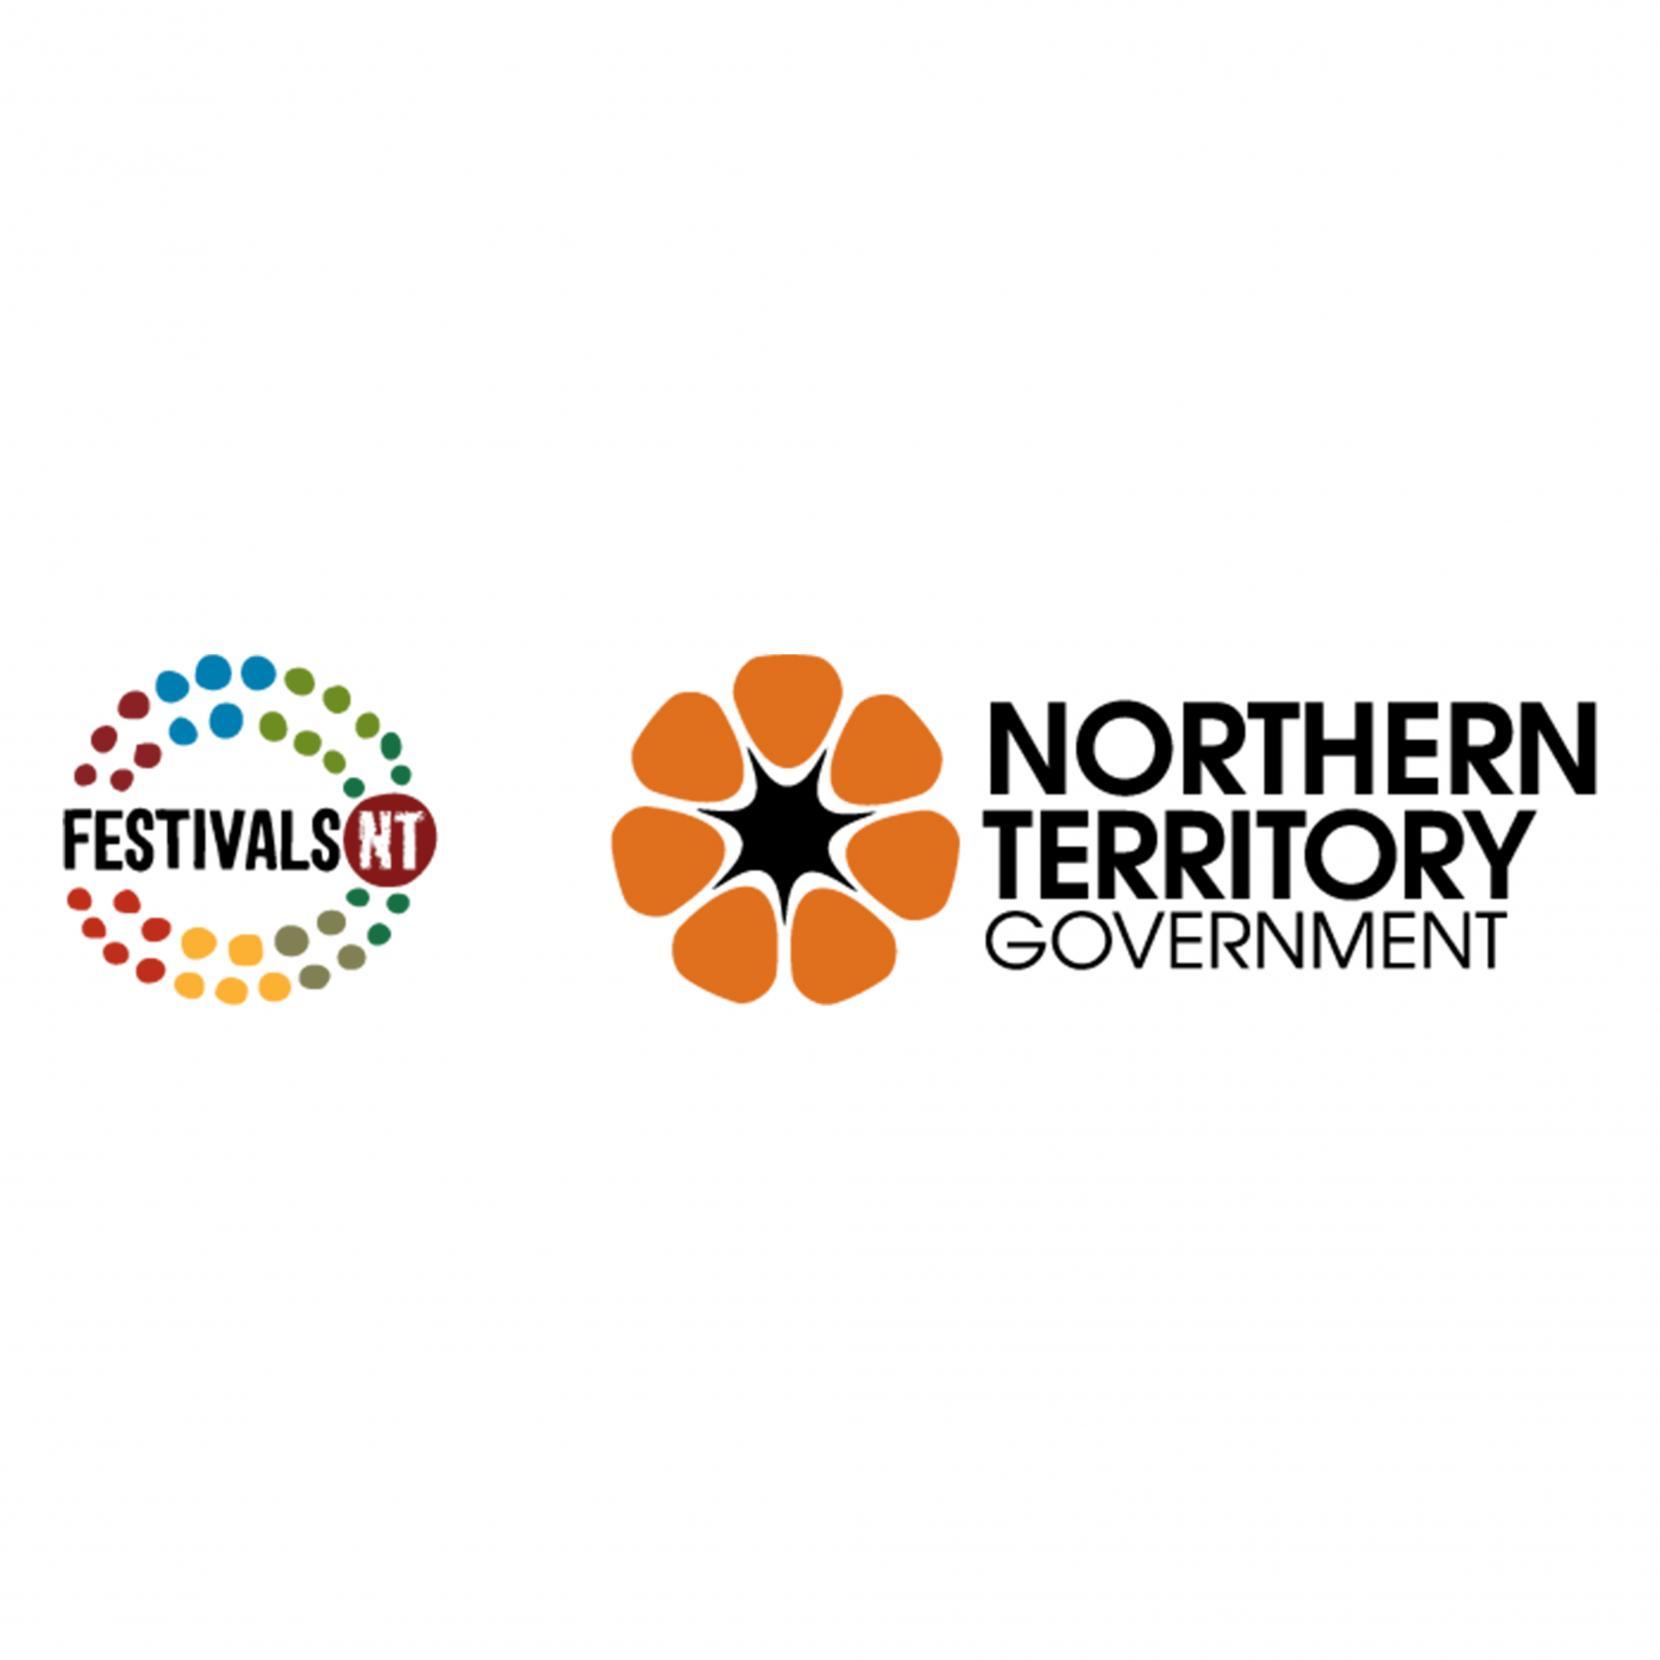 Festivals NT